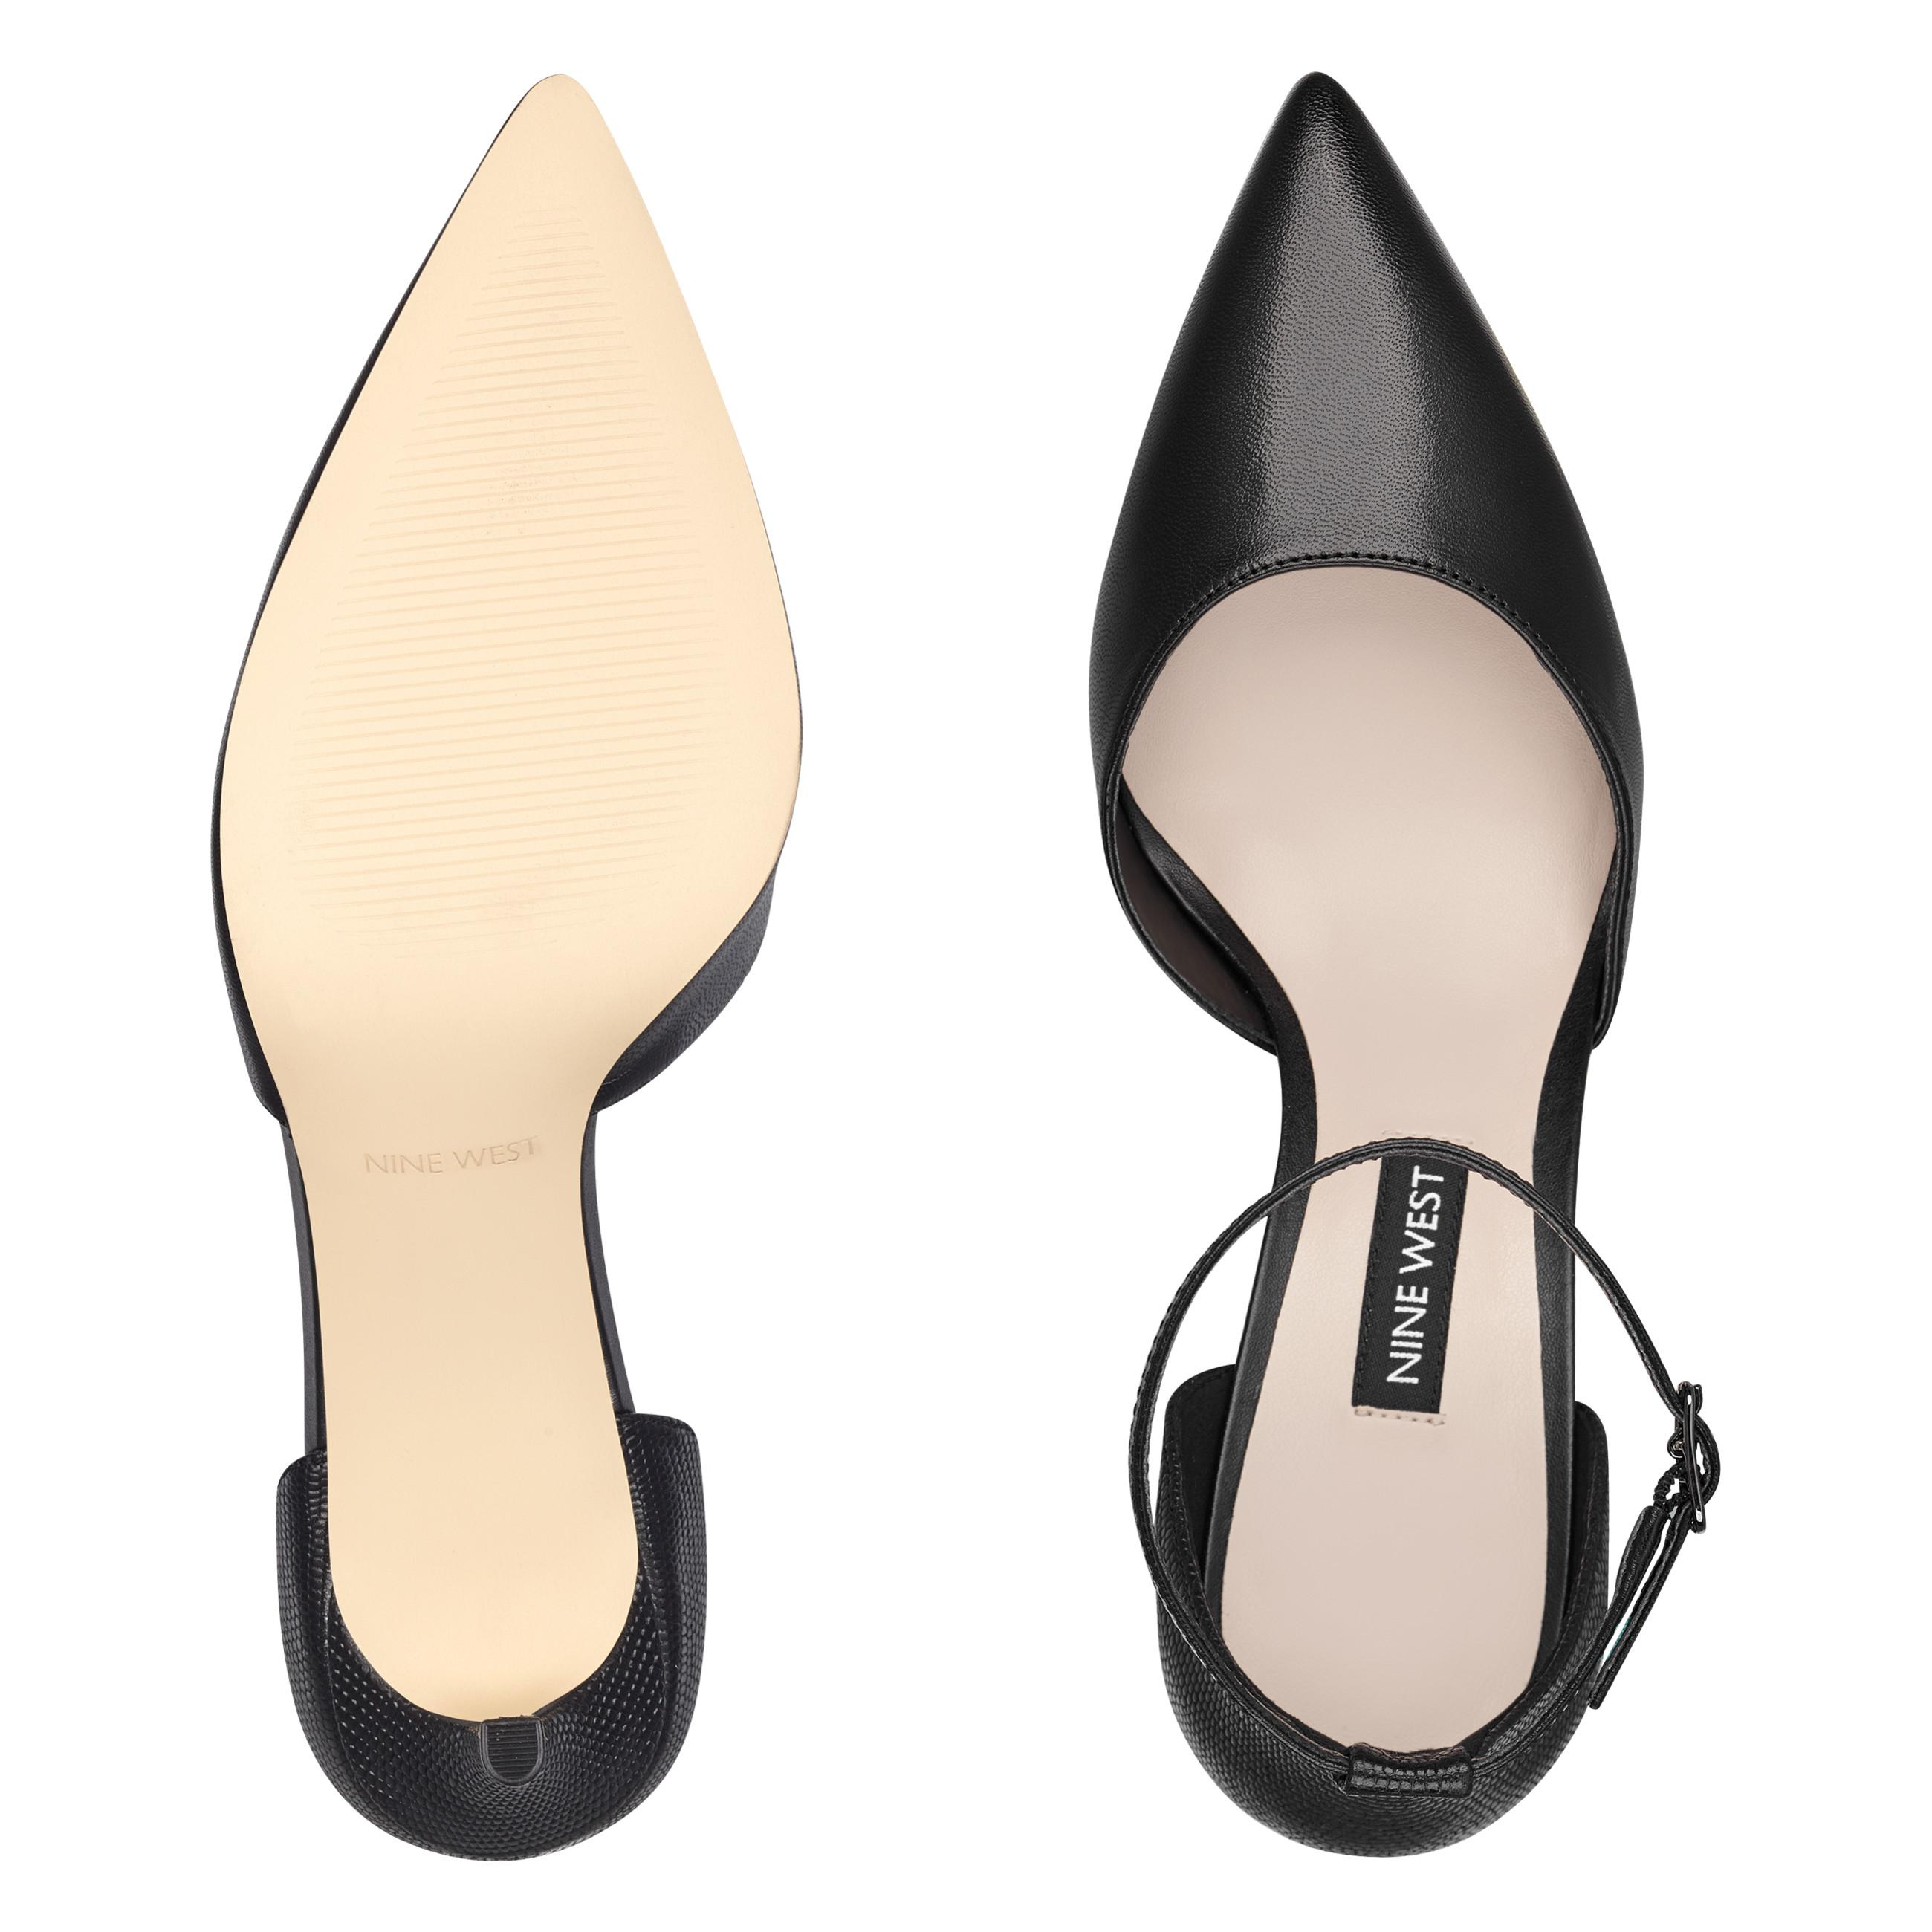 3755e4df7c3 ... Marisa Ankle Strap Pumps - Lyst. View fullscreen